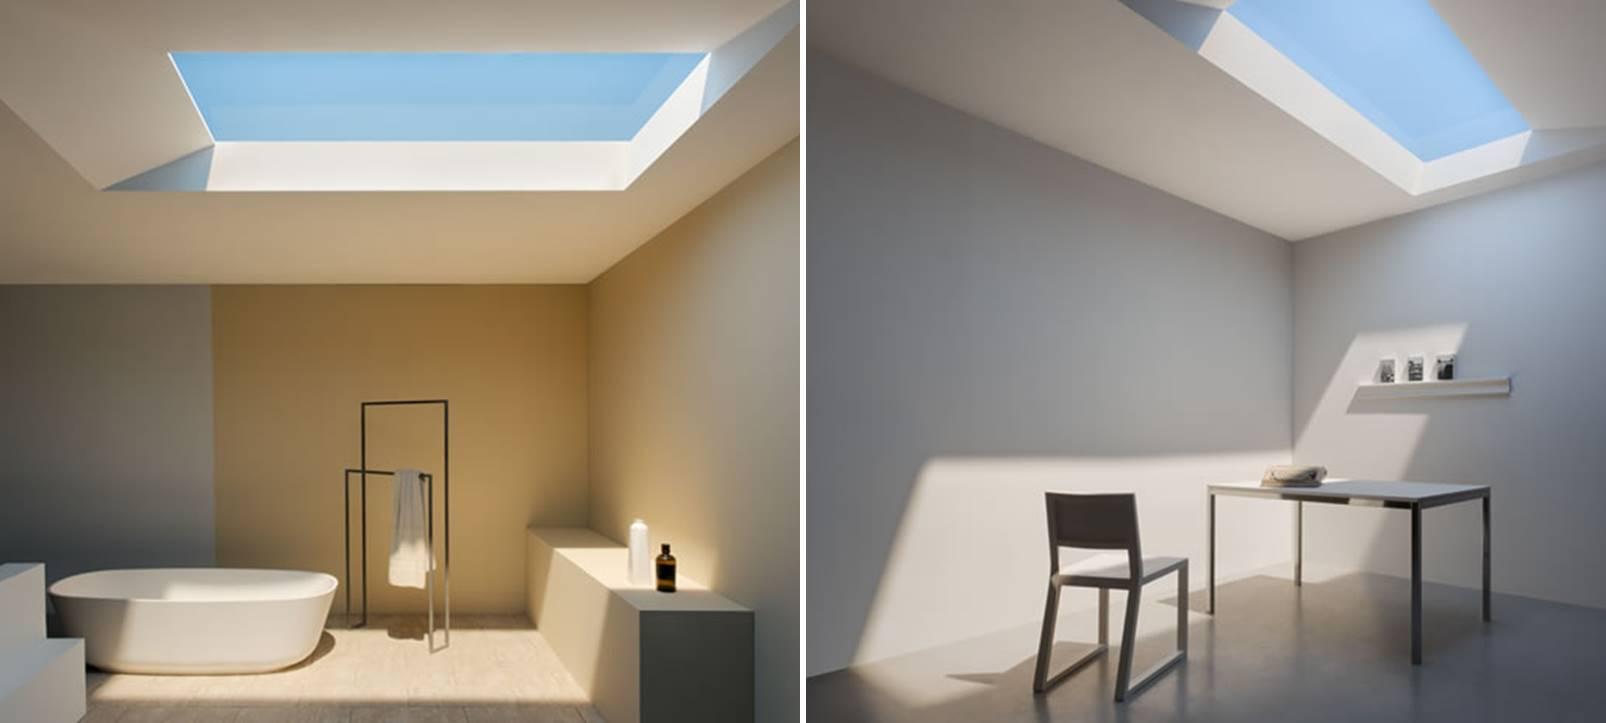 Beautiful Bathroom  Bathroom Designs 686 Views